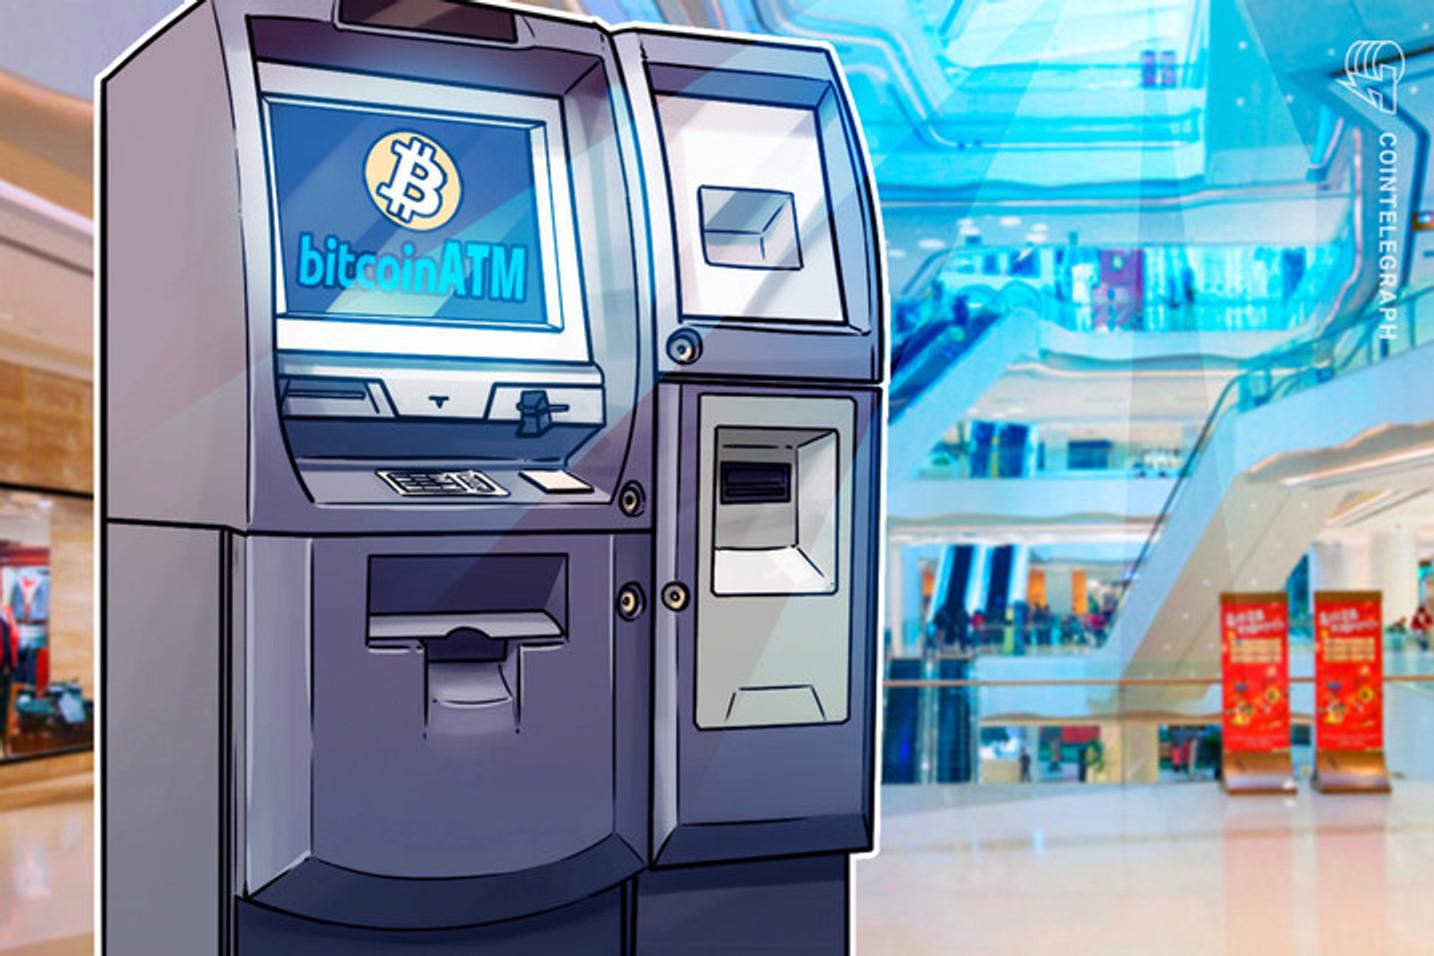 CoinCloud expande caixas eletrônicos de Bitcoin no Brasil e chega a Curitiba (PR) e a Campinas (SP)